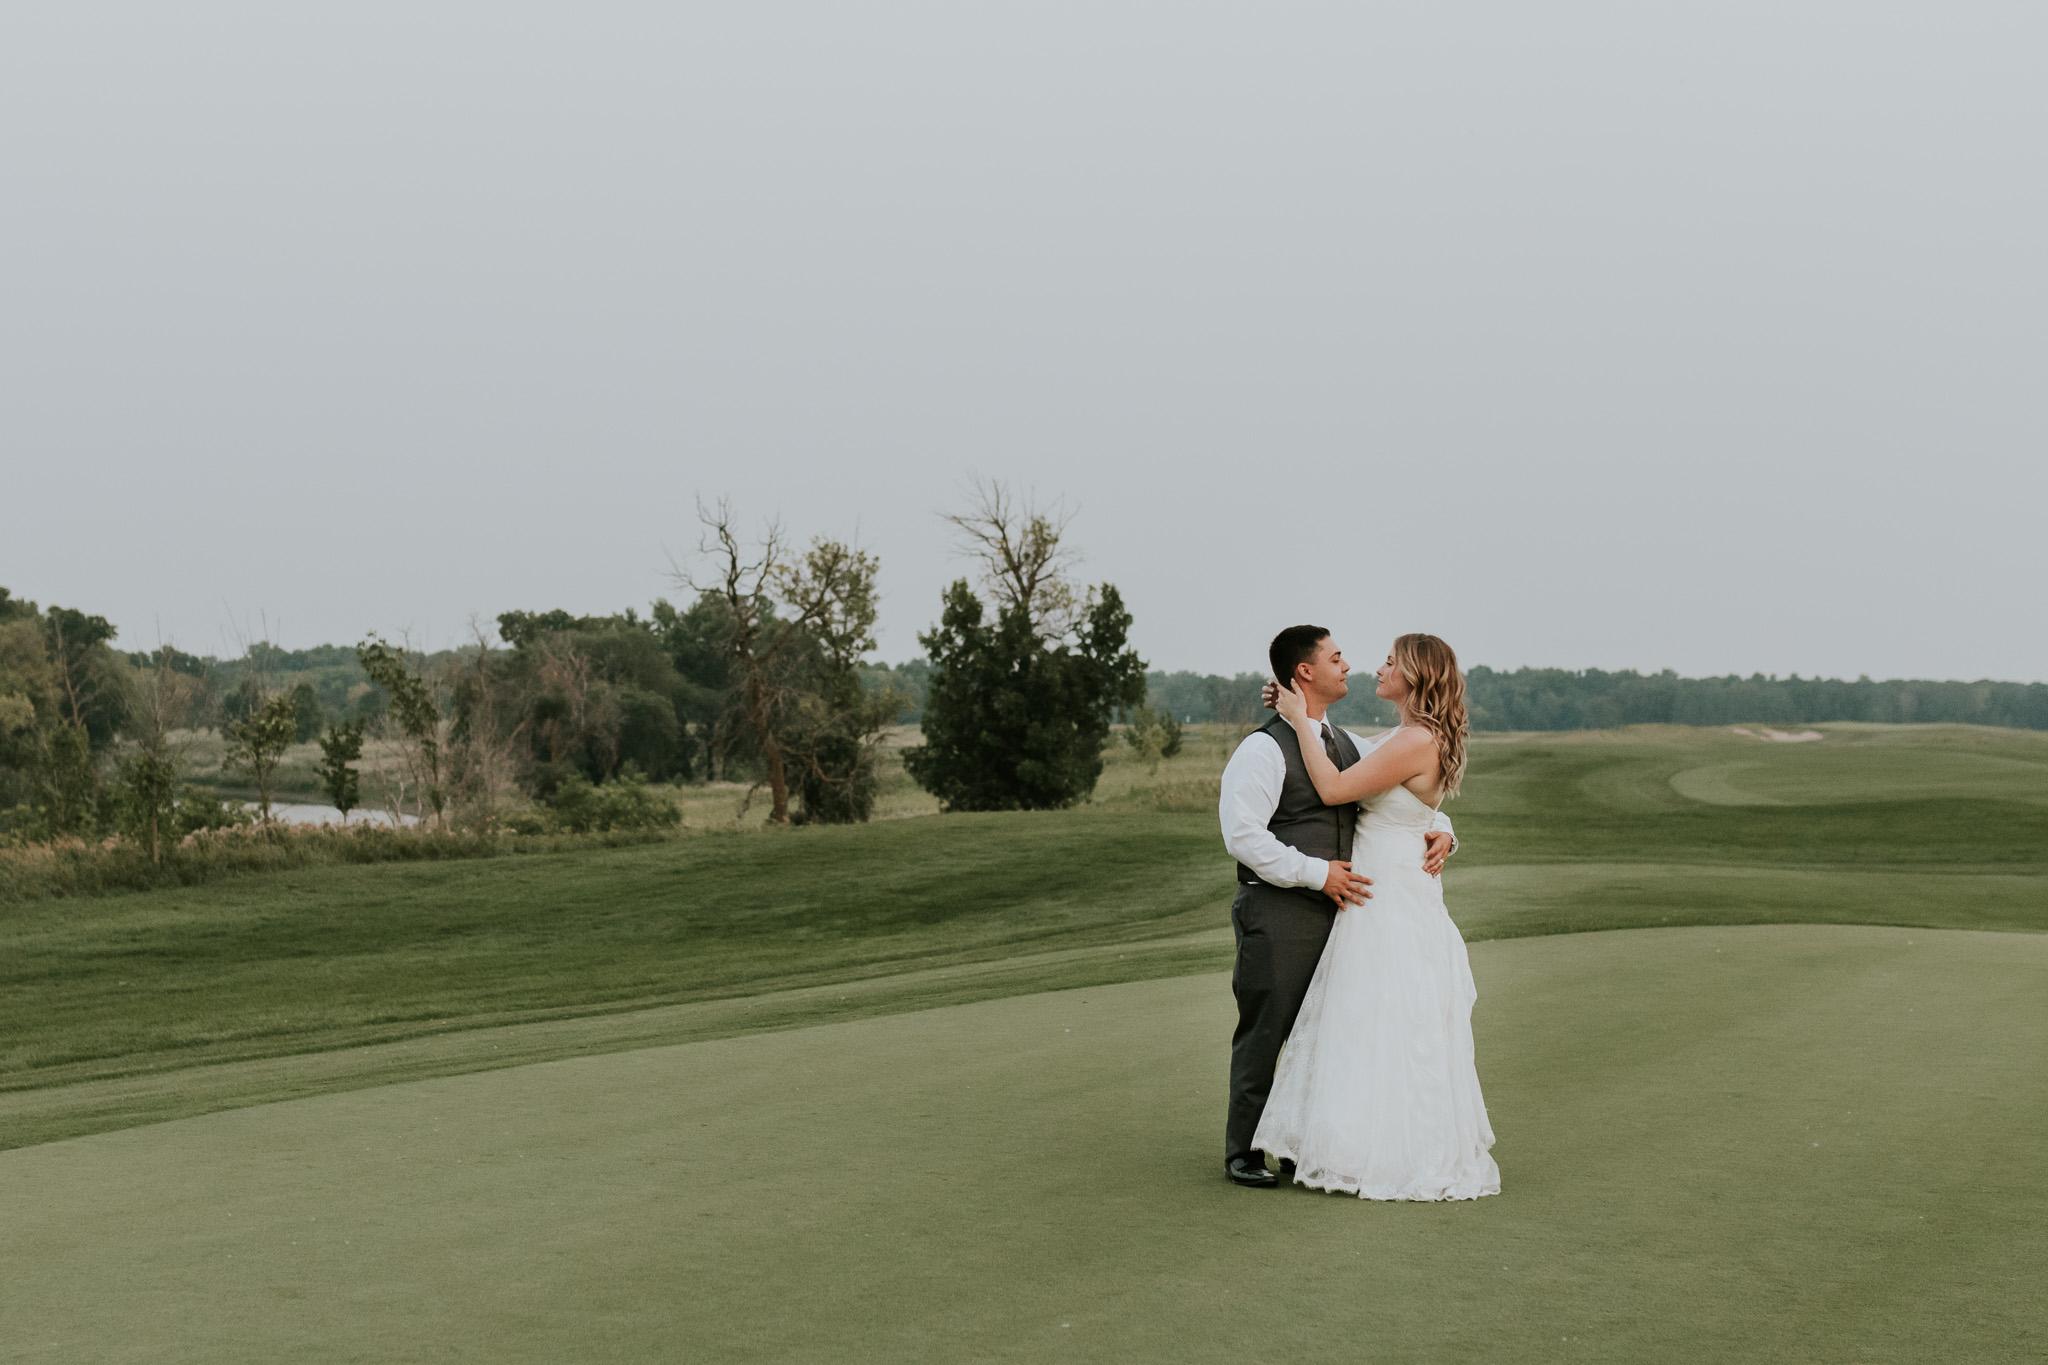 southwood-golf-course-wedding-winnipeg-116.jpg